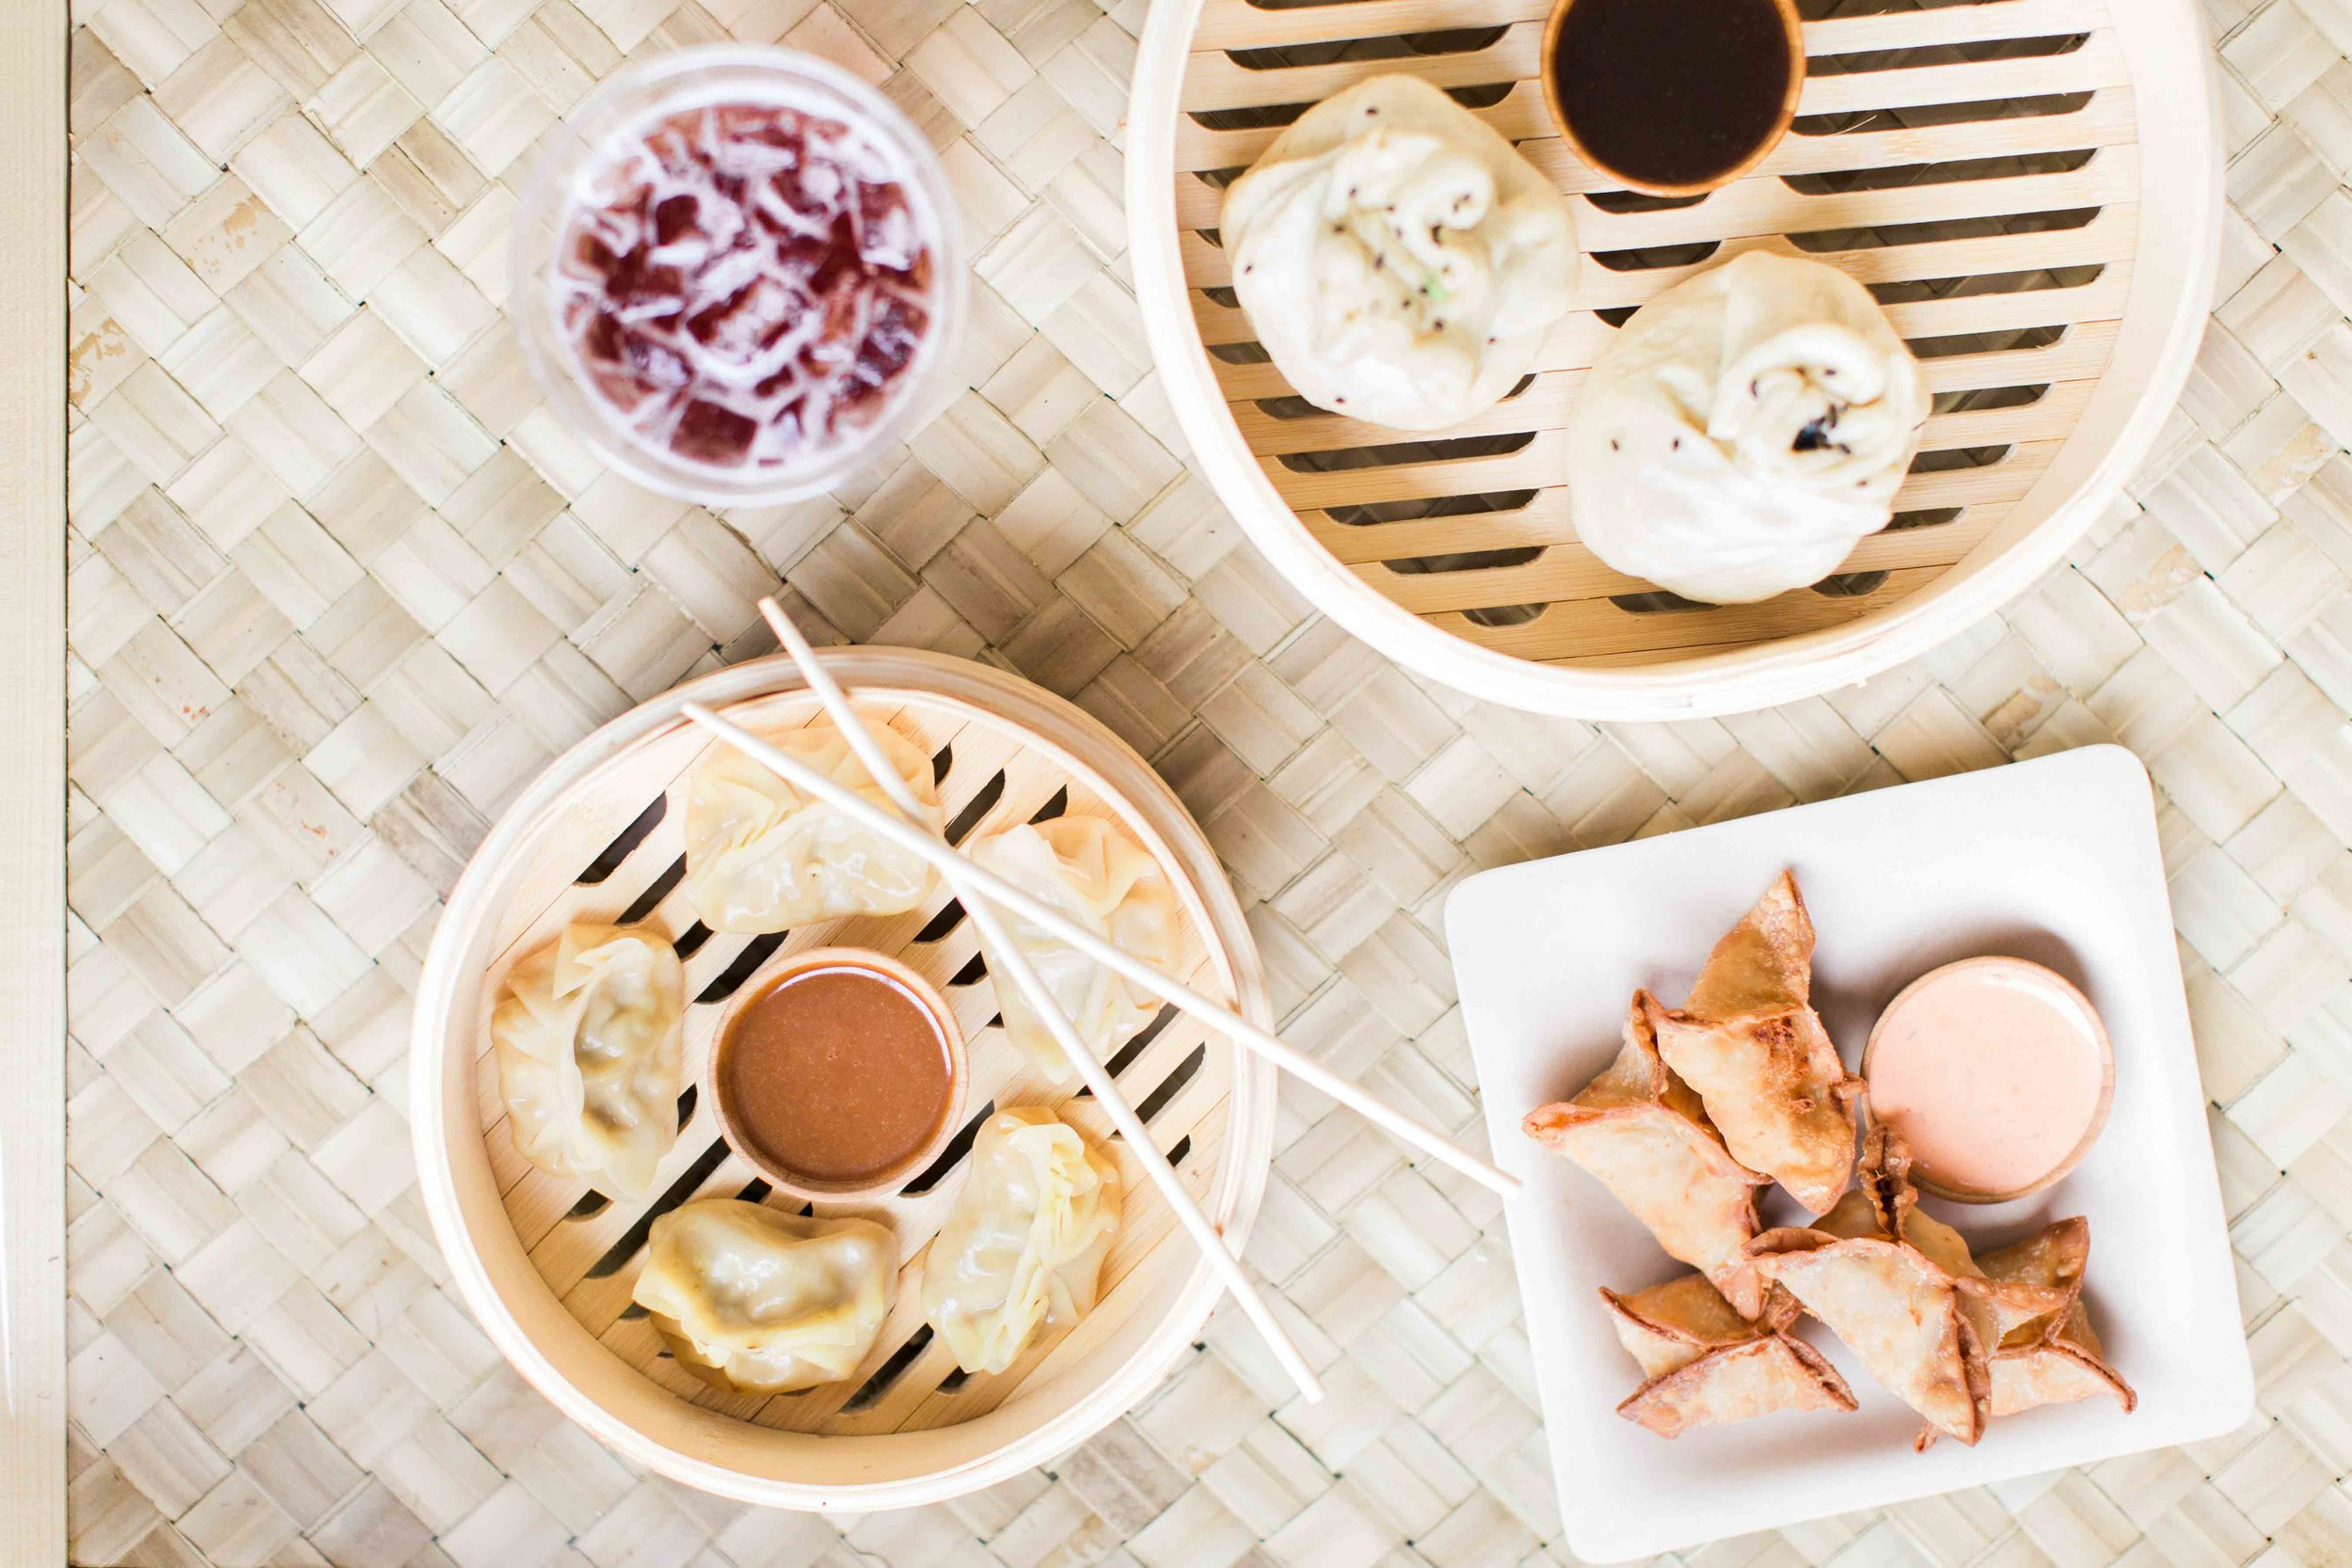 Dumpling-Darling-bao-buns-dumplings-table-spread.jpg